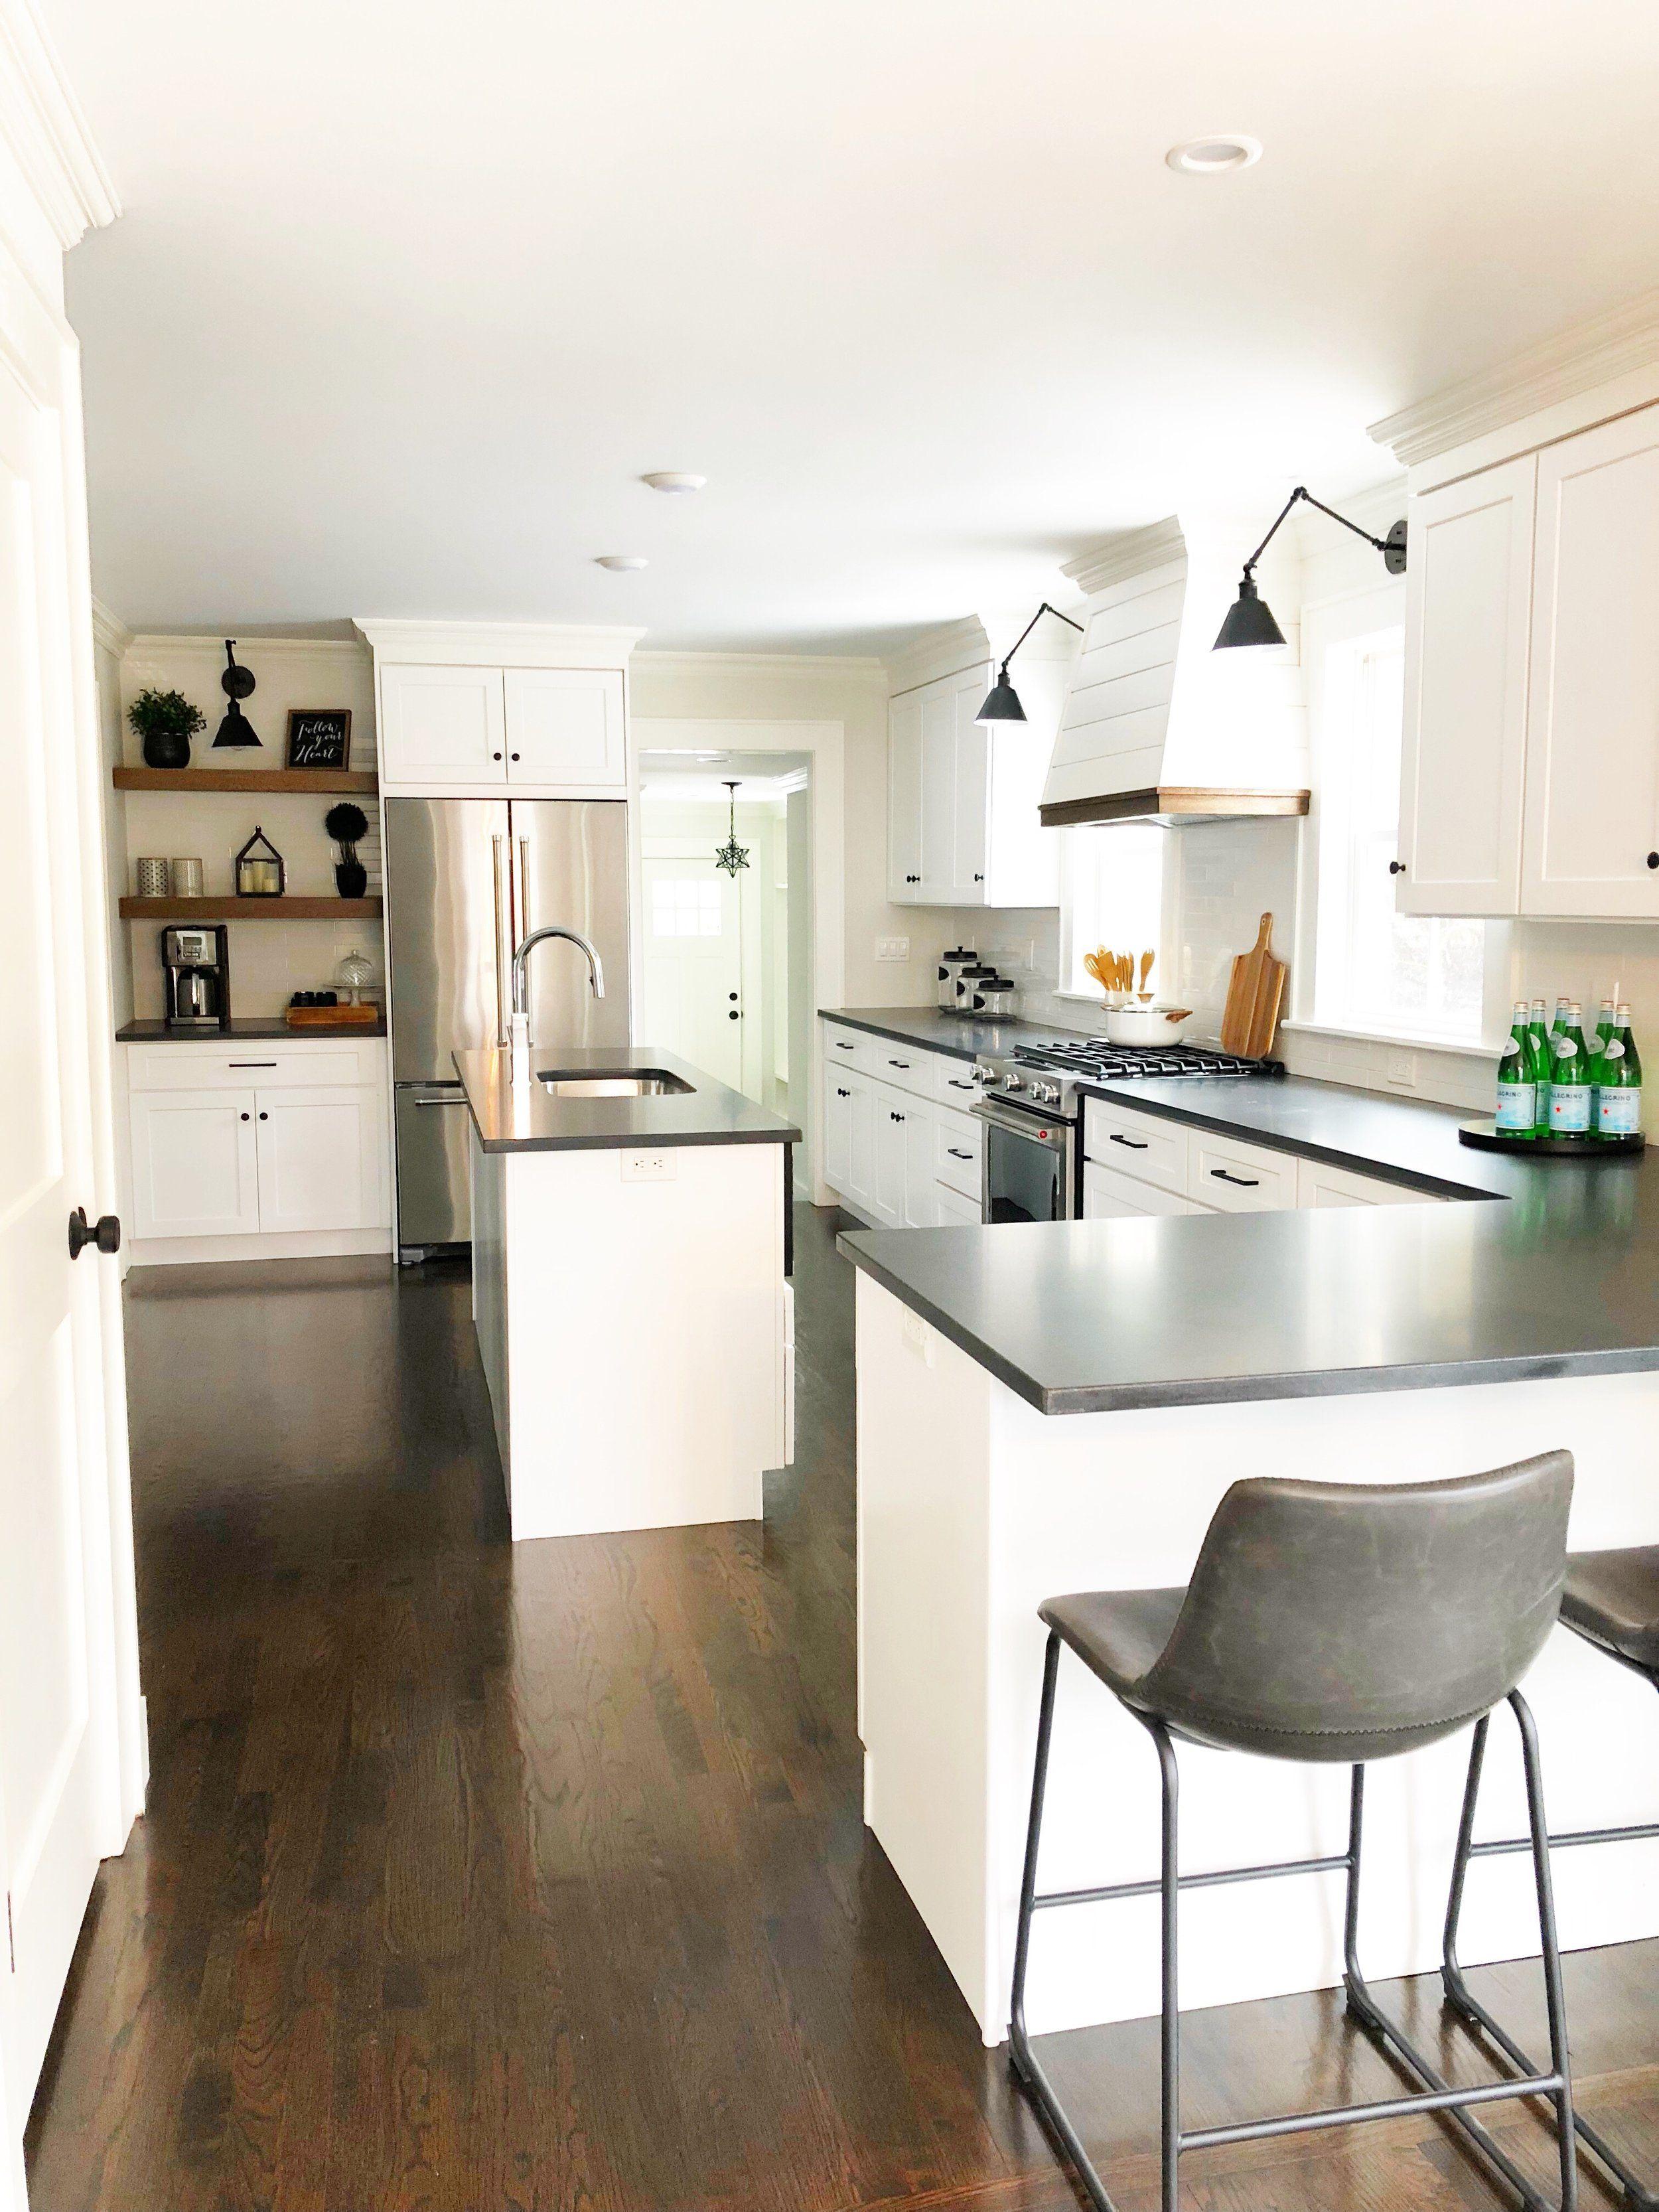 Custom Shiplap Range Hood With Wood Trim Designed By Ana G Homes Fairfield Ct 06824 Rang Modern Farmhouse Kitchens White Modern Kitchen Black Countertops